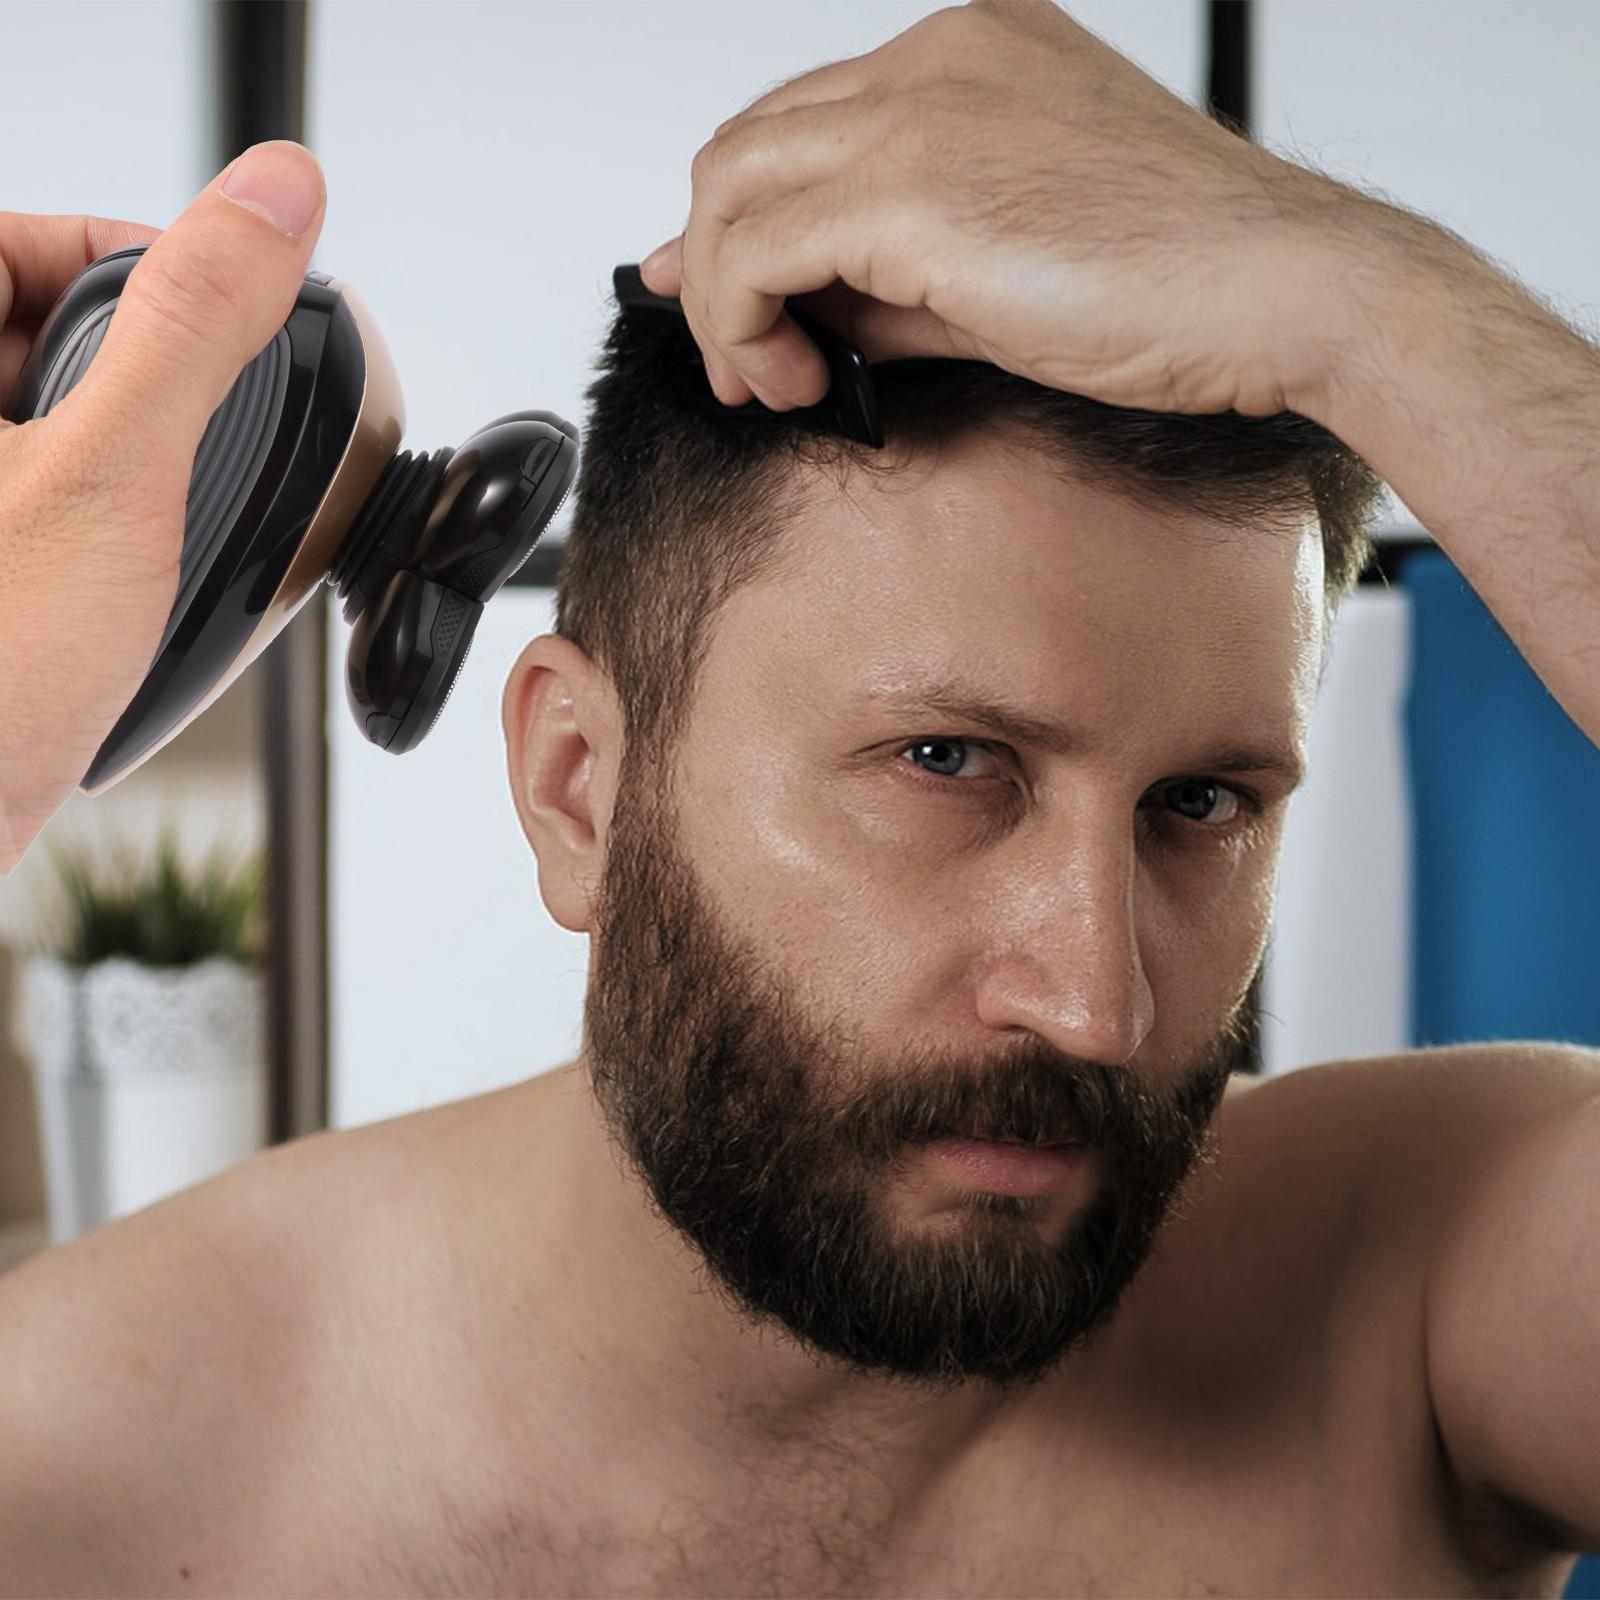 TEHAUX Shaved Head Hair Clipper Male Electric Hair Clippers Adult Razor